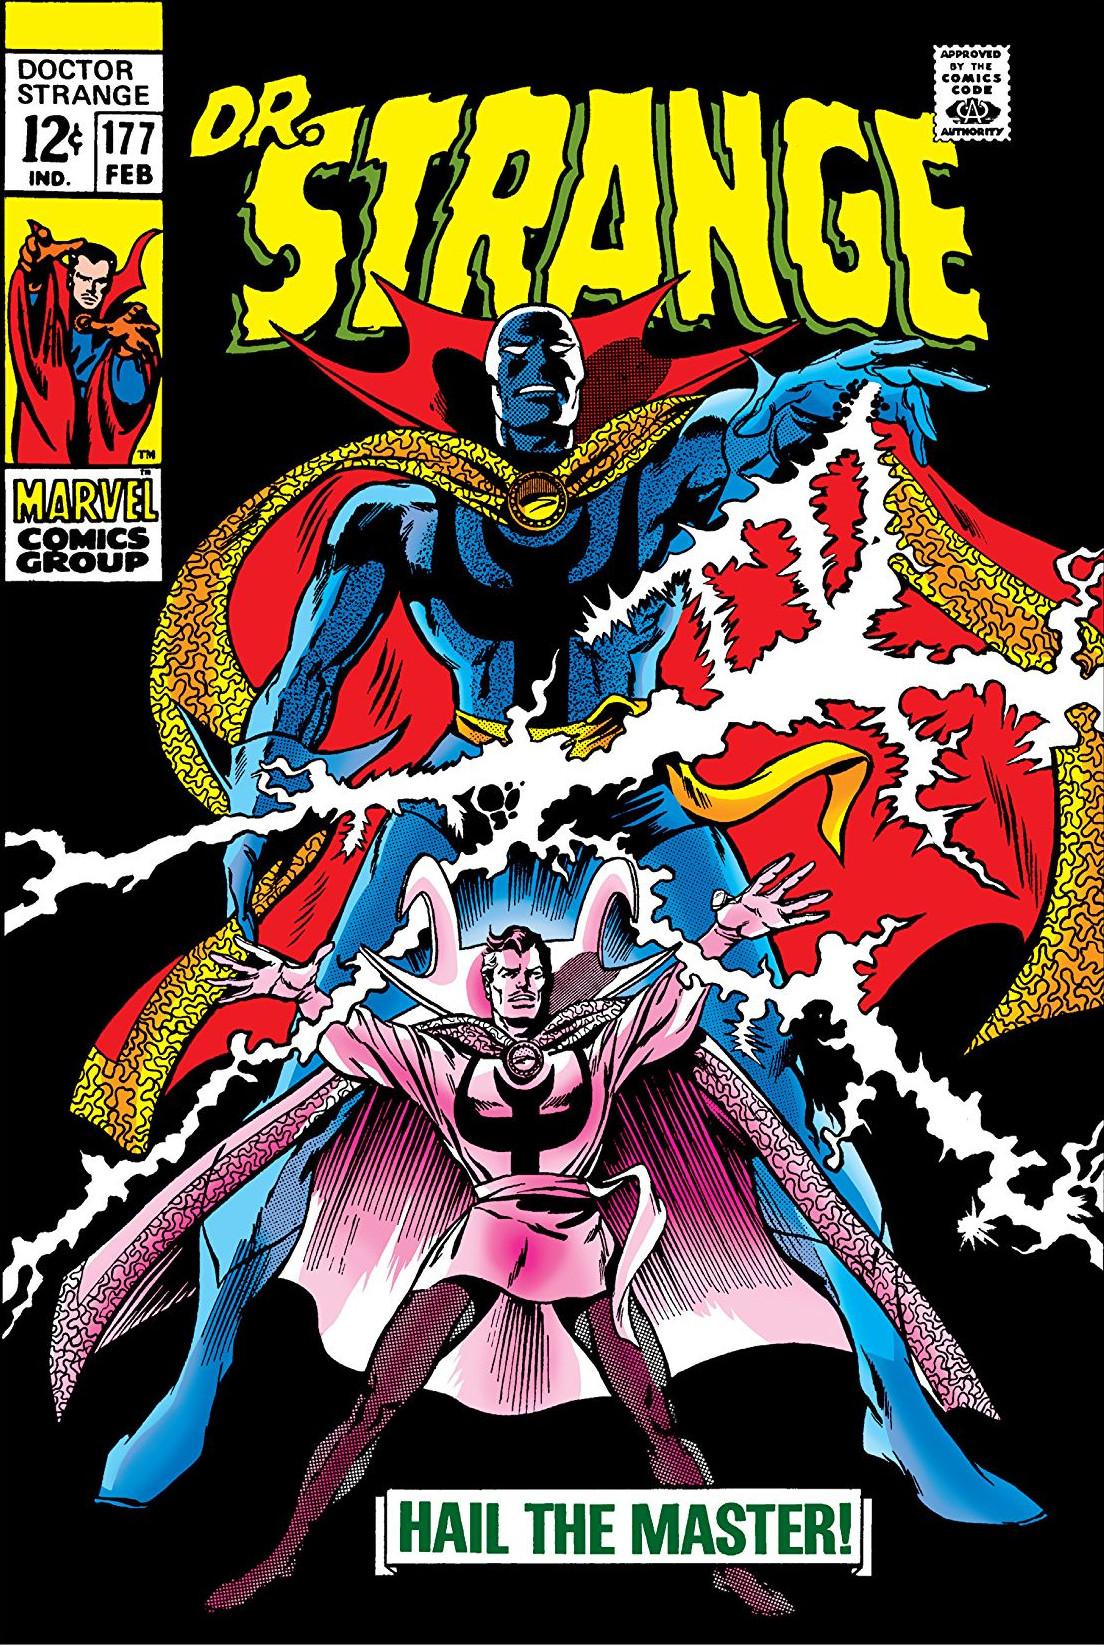 Doctor Strange Vol 1 177